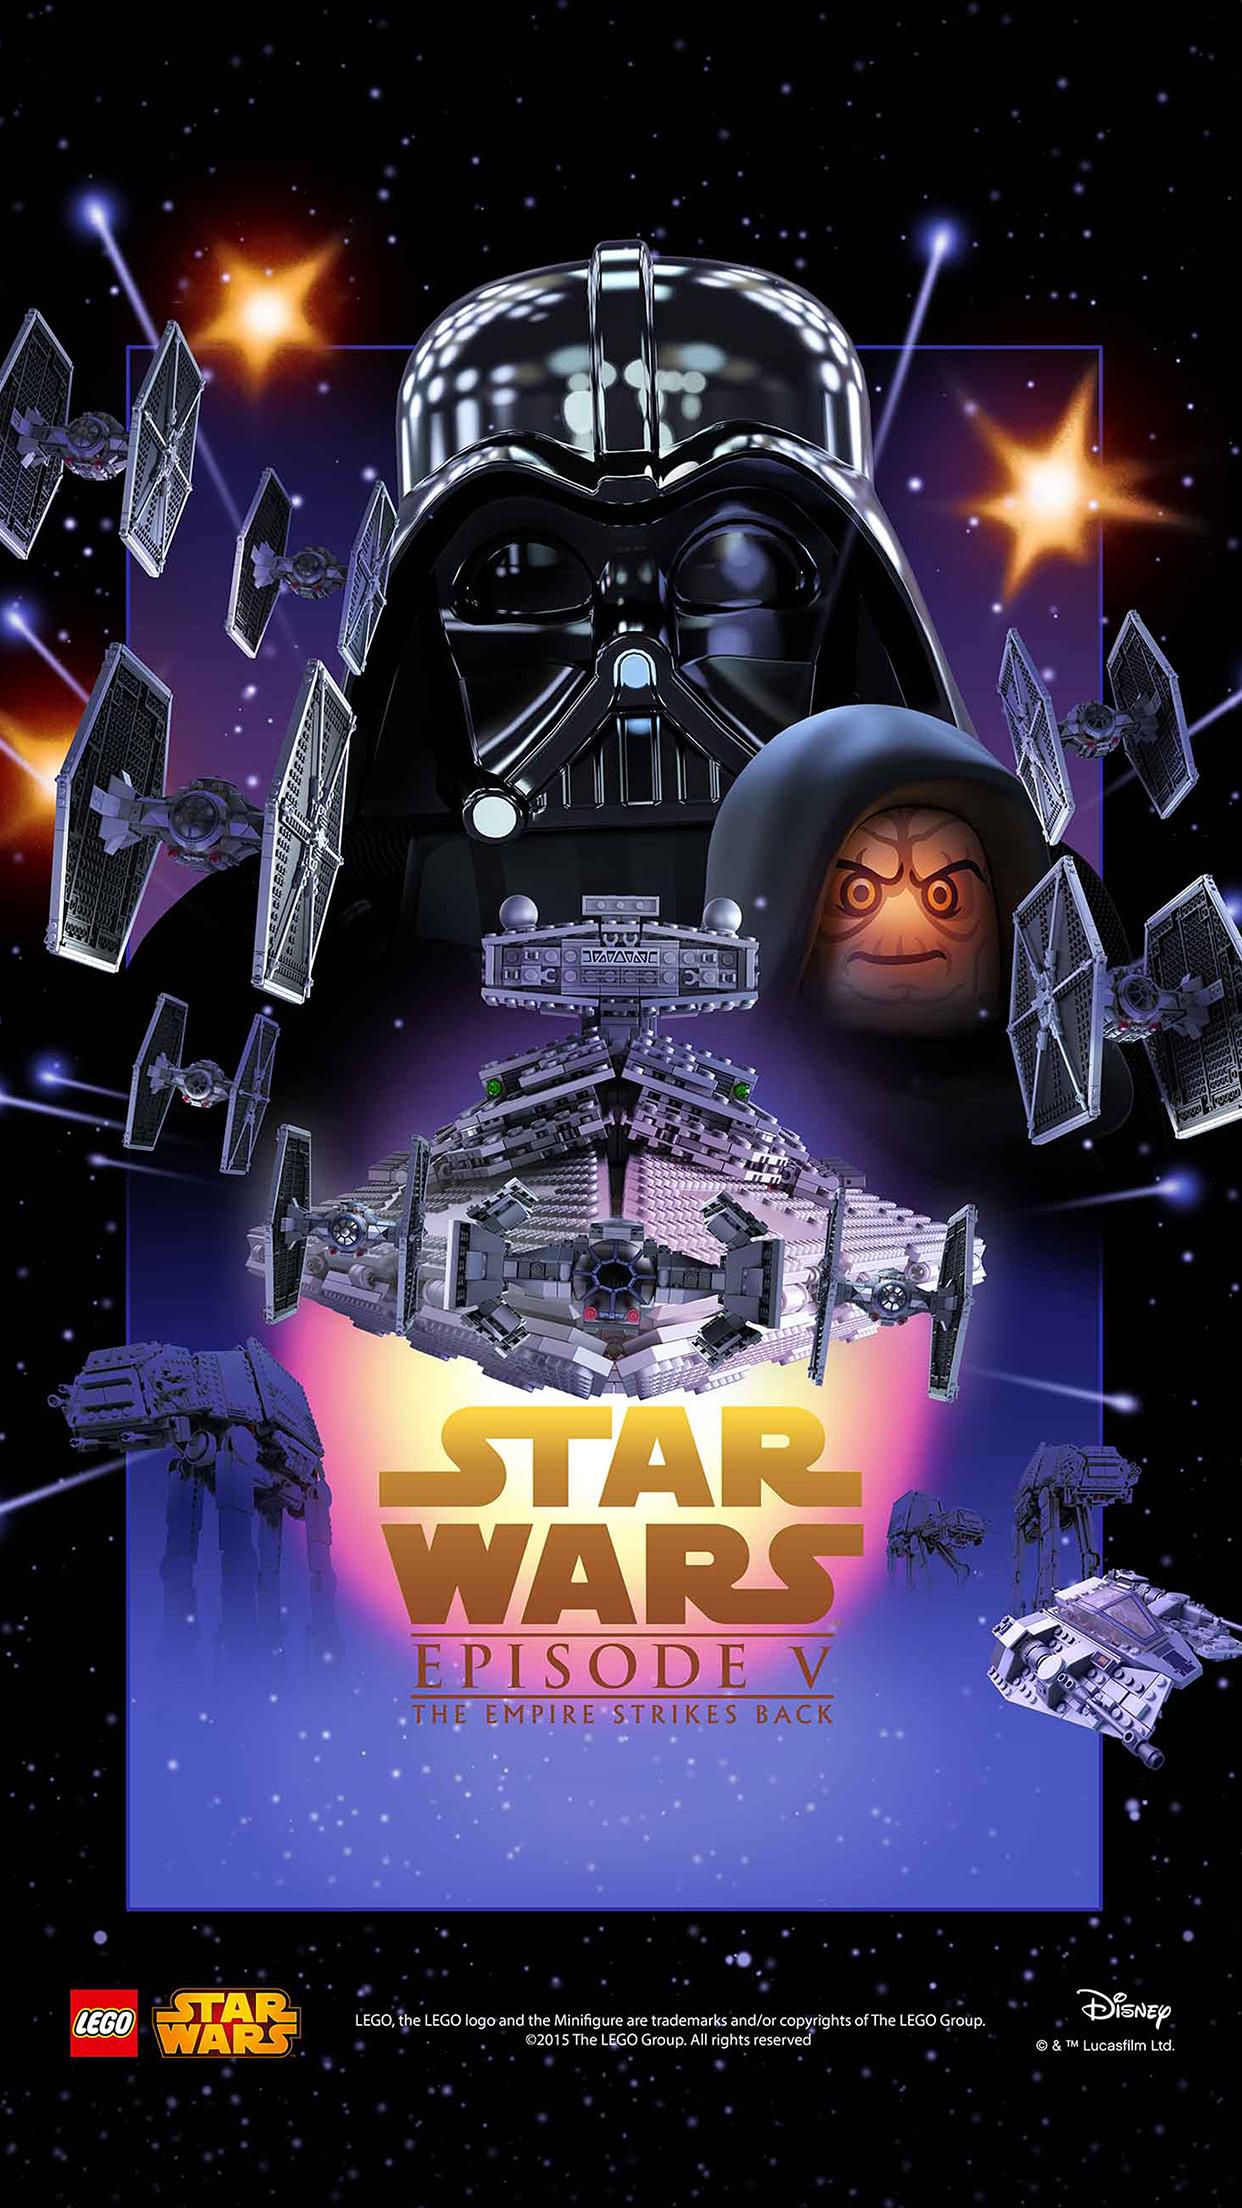 Car Wallpaper For Android Ap23 Starwars Lego Episode 5 Empire Strikes Back Film Art